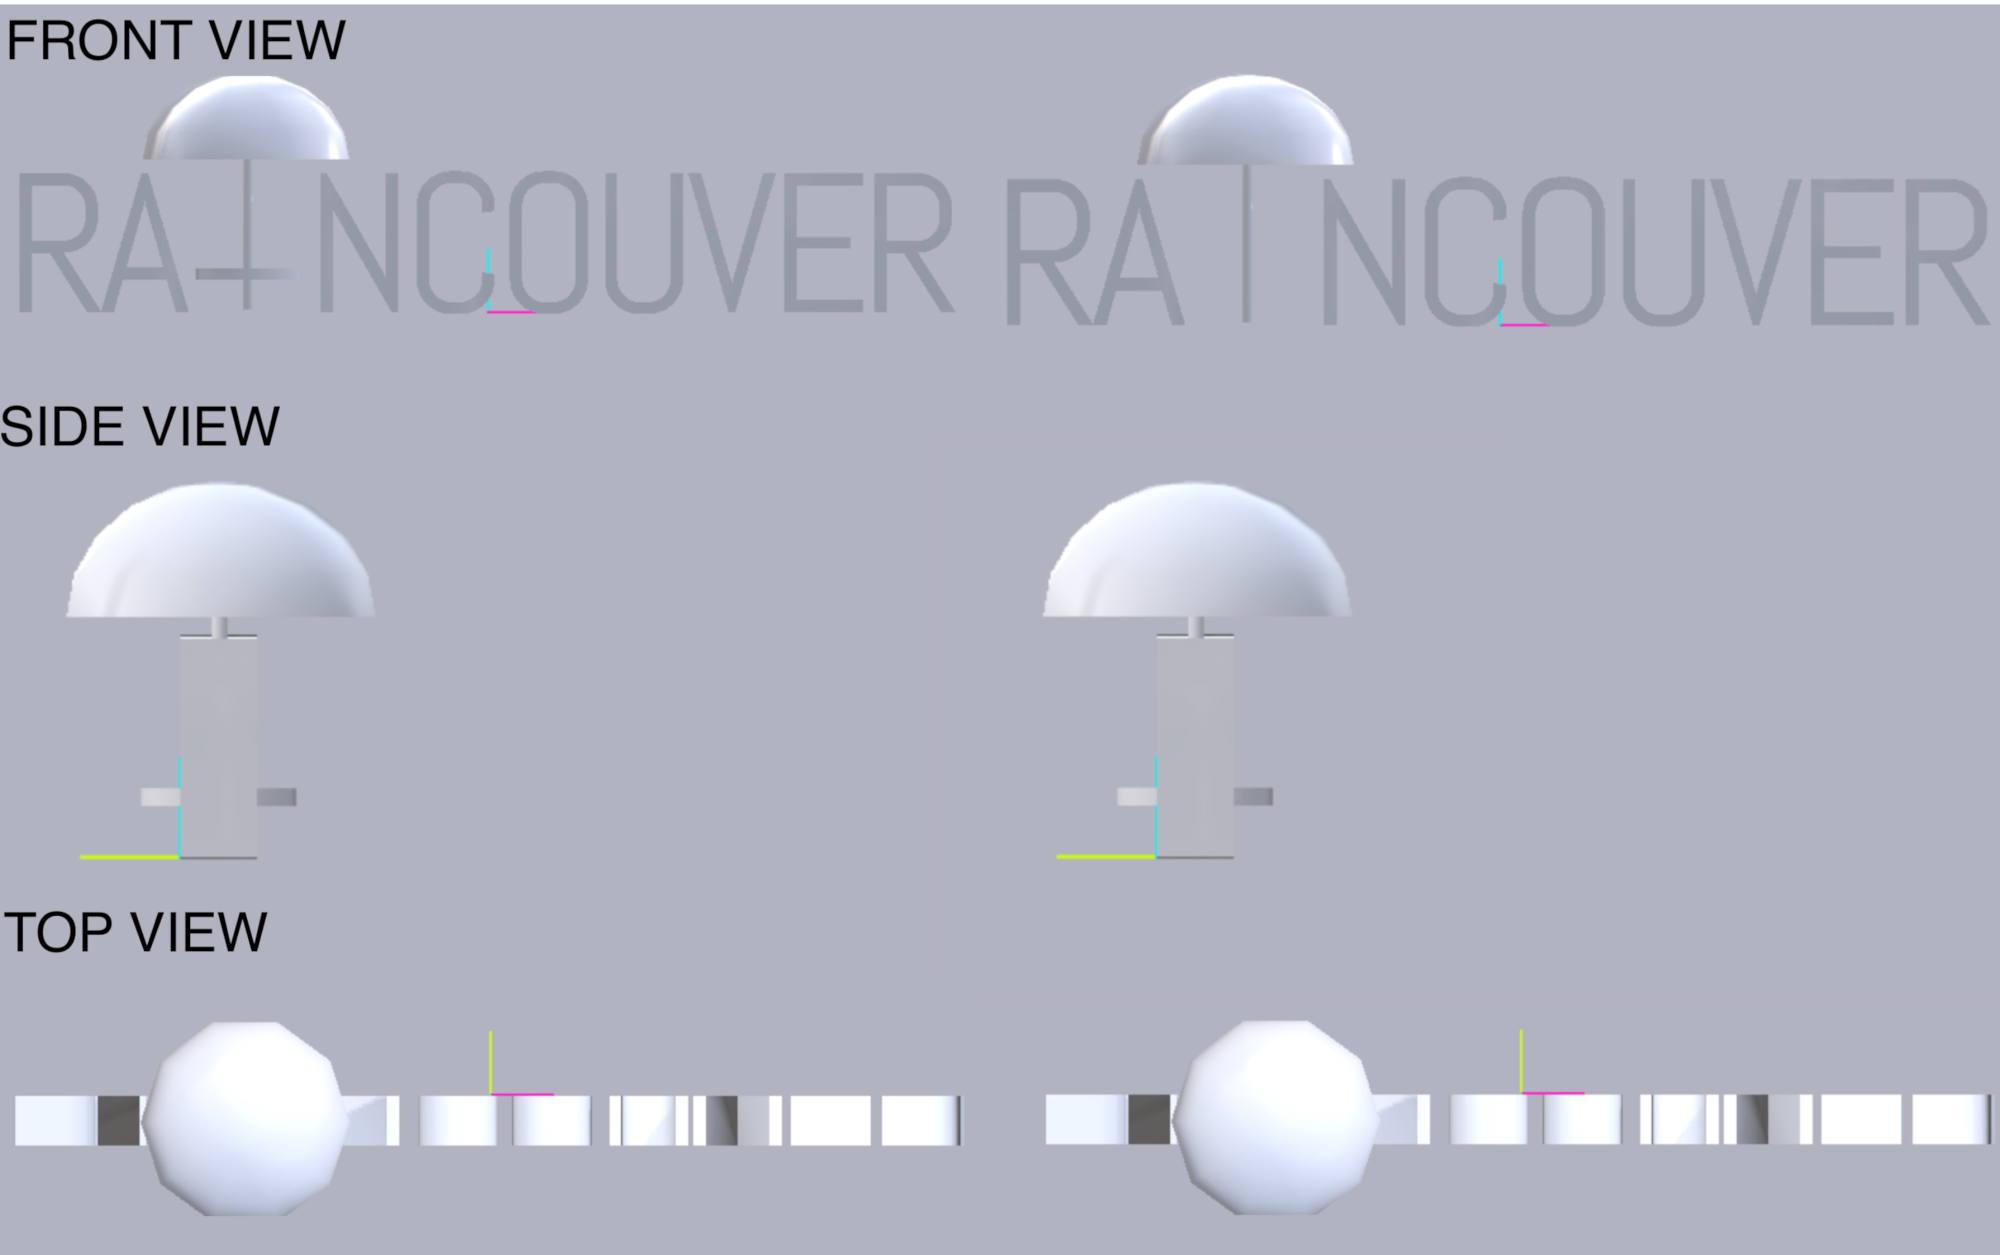 B11 - RAINCOUVER 2 - 11.jpg